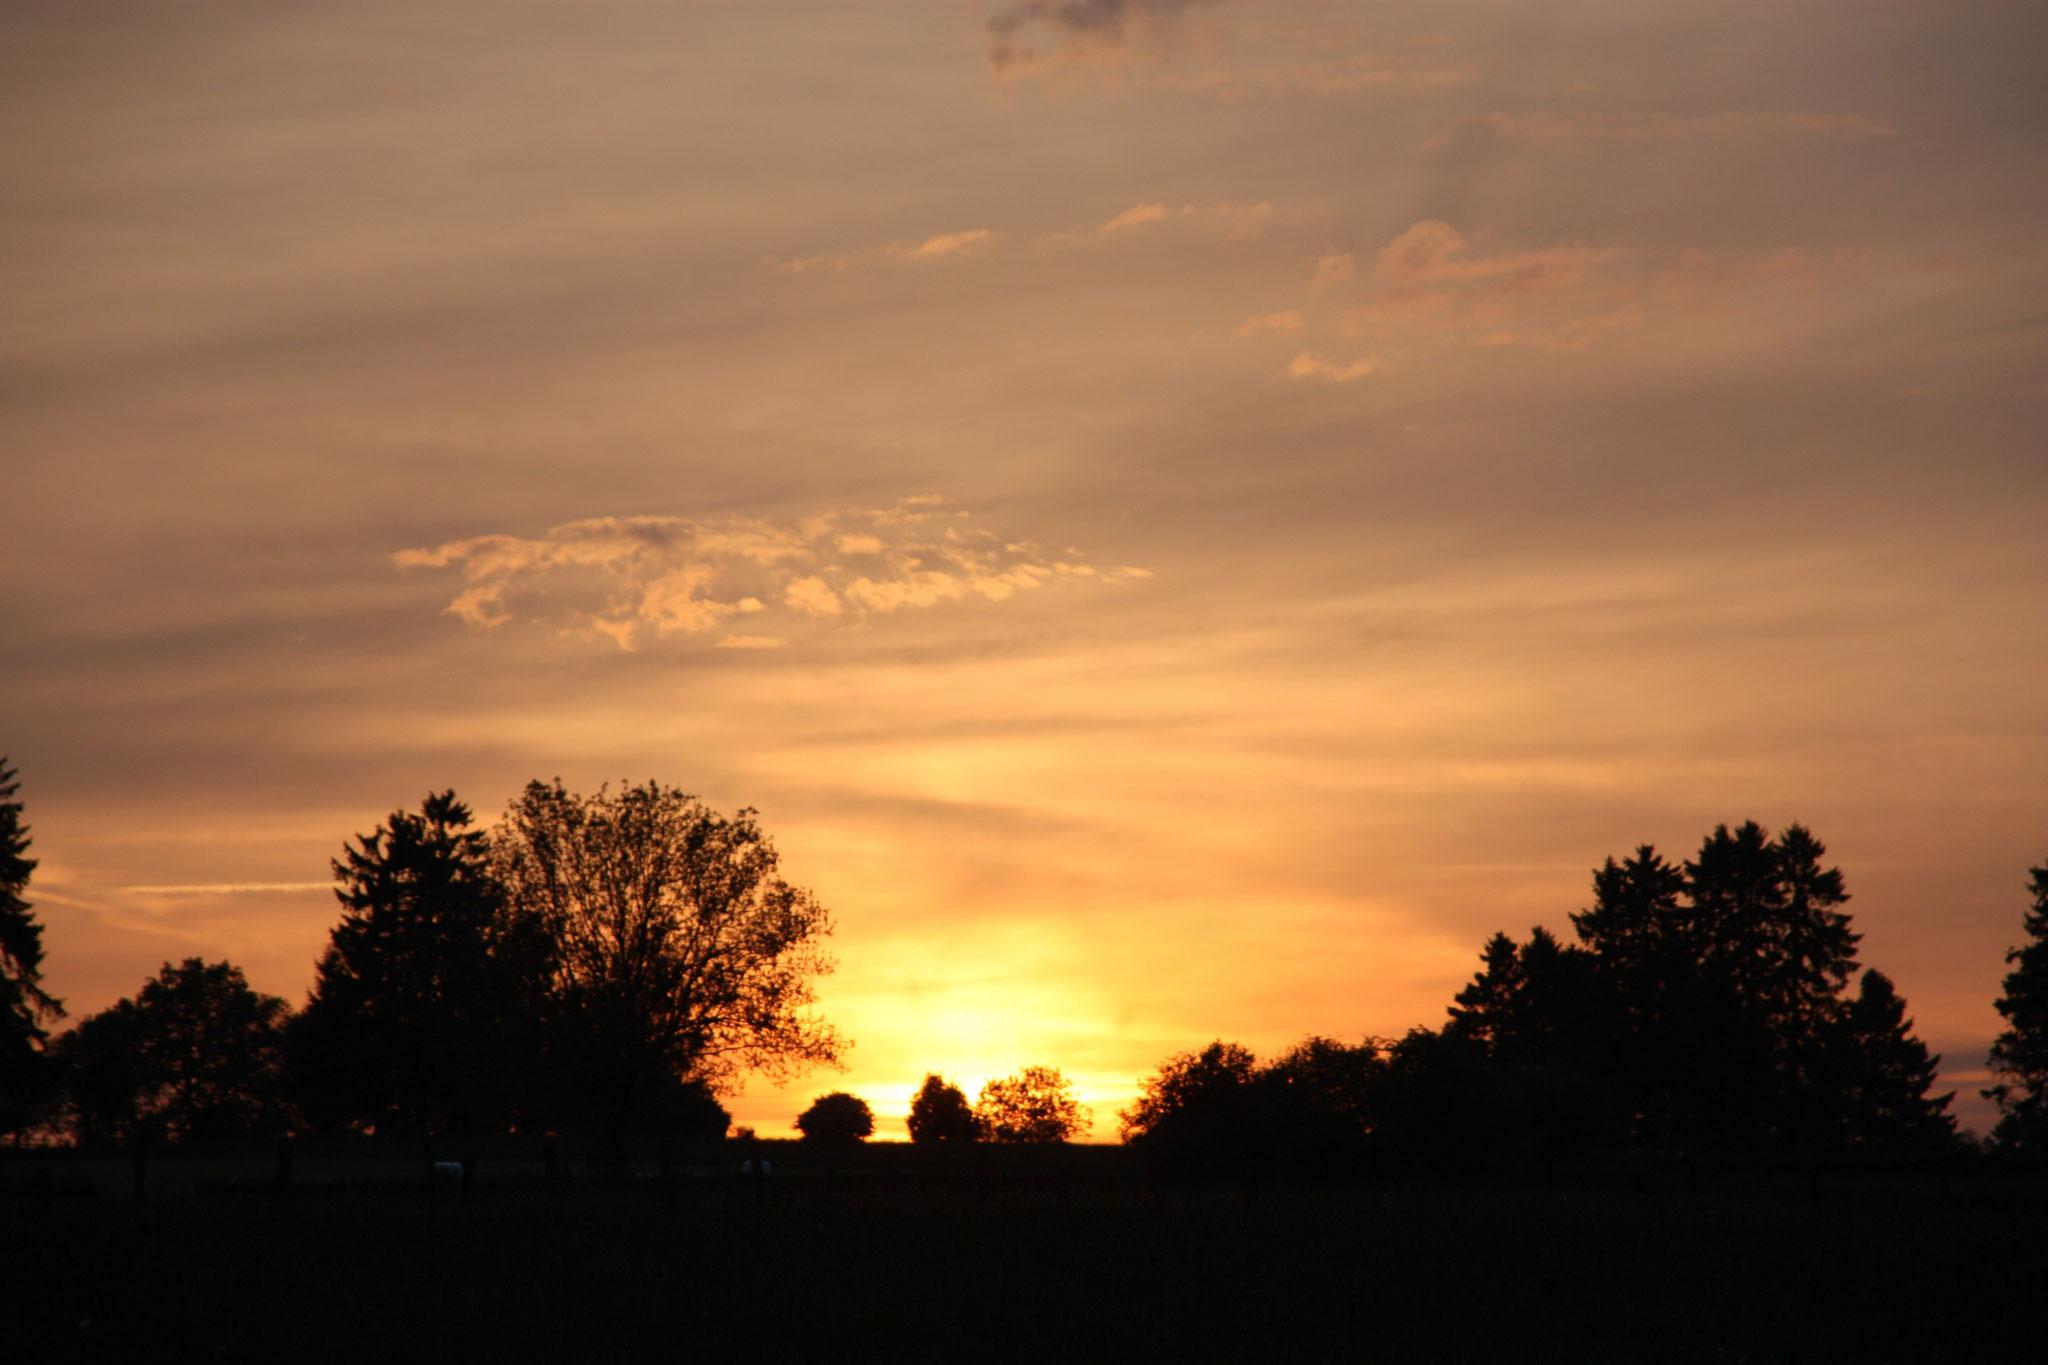 Sonnenuntergang auf der Terrasse  |   Zonsondergang op het terras